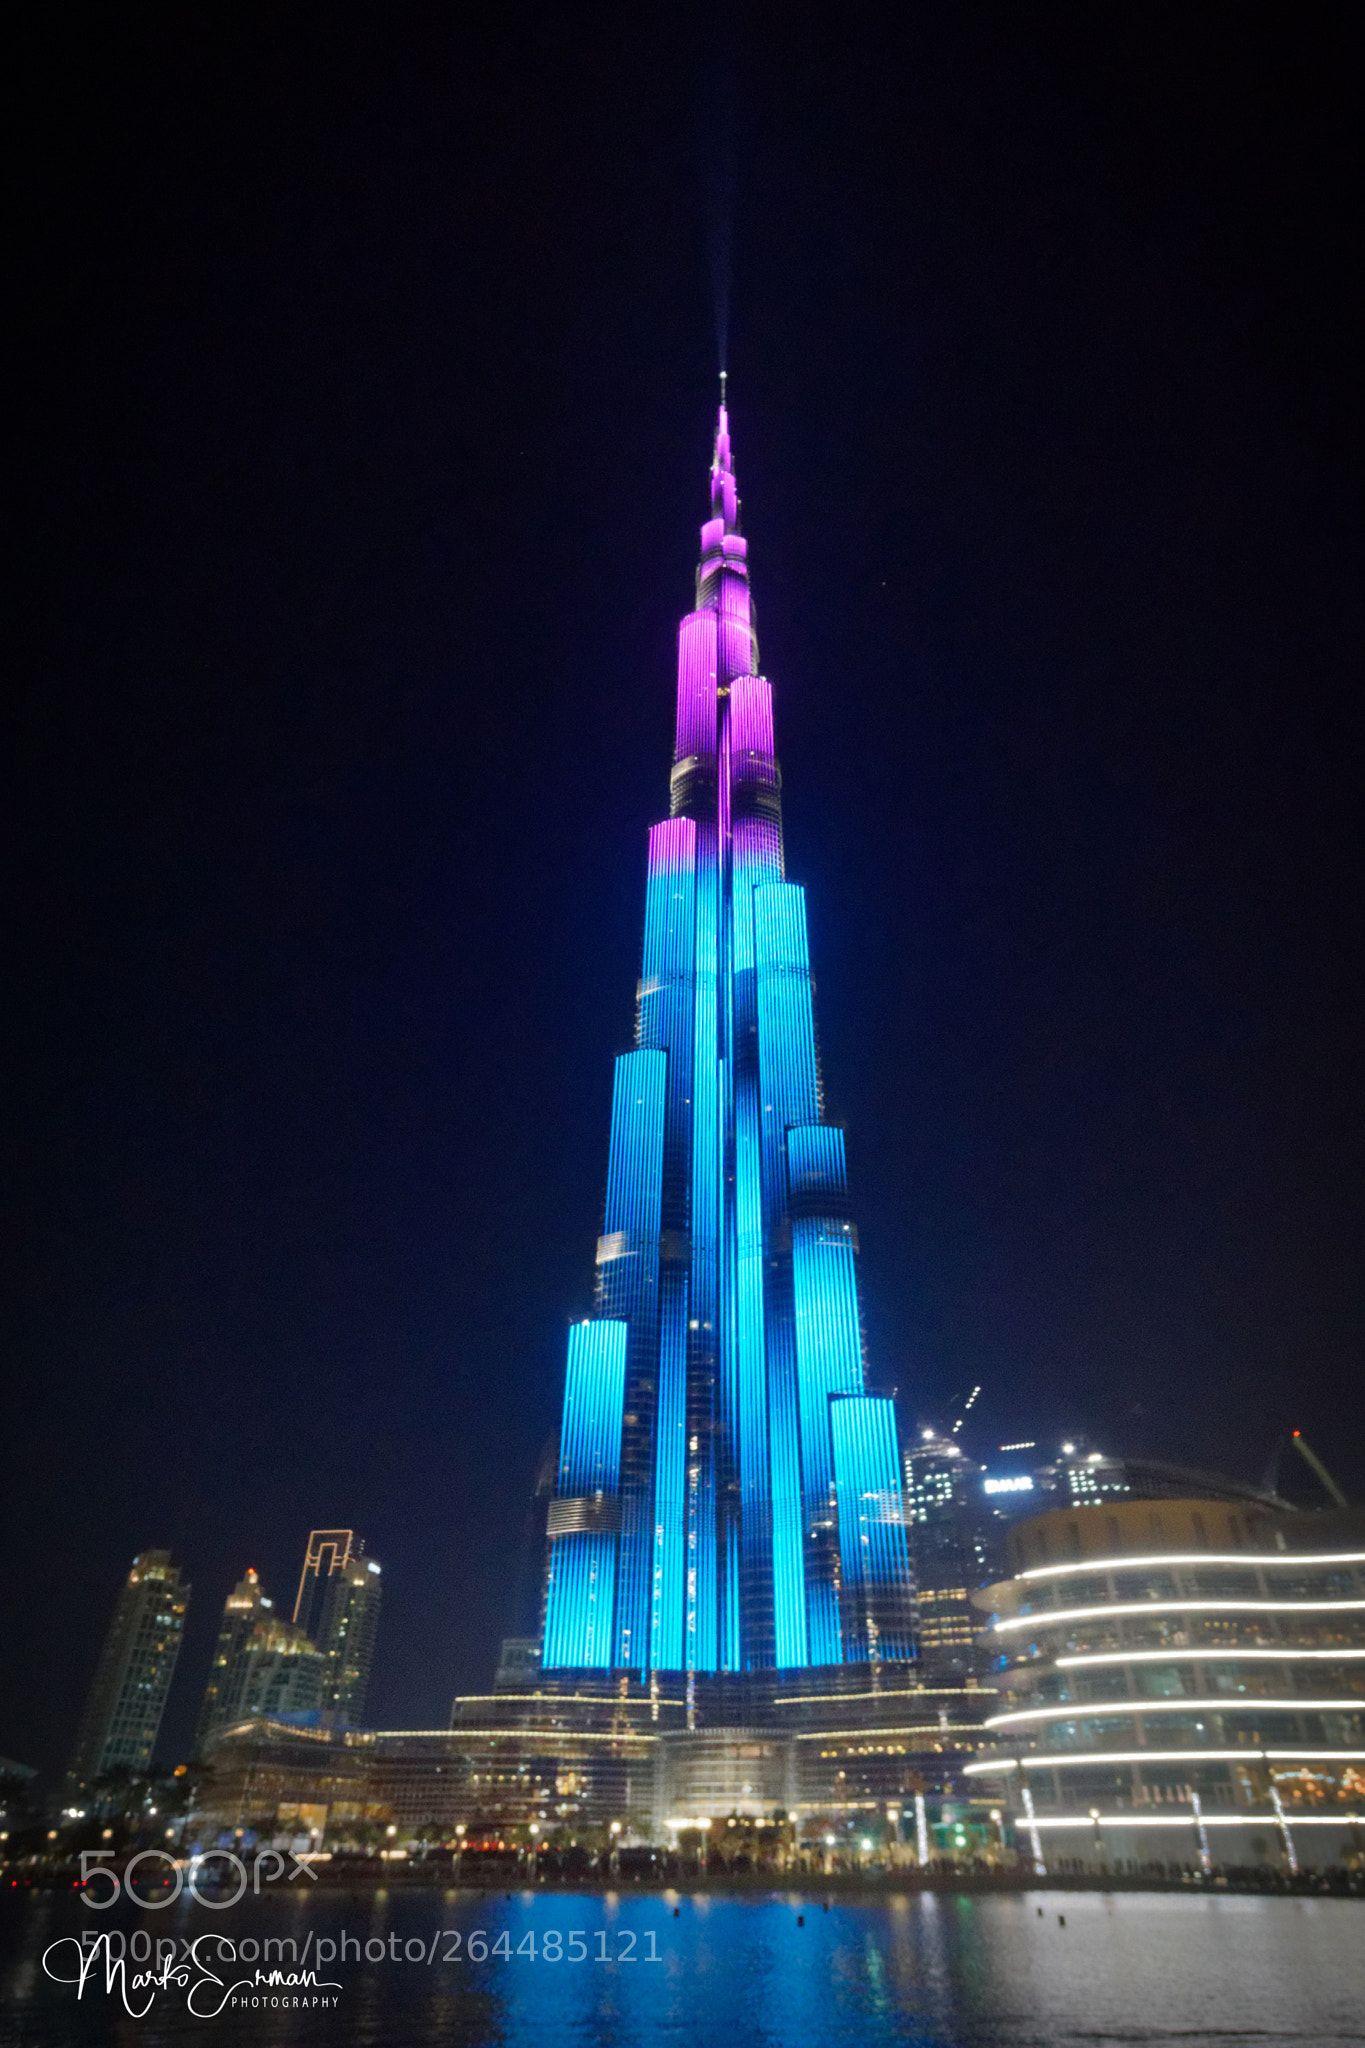 Night Show At Burj Khalifa By Markoerman Burj Khalifa Dubai City Unique Buildings Burj khalifa night view hd wallpaper